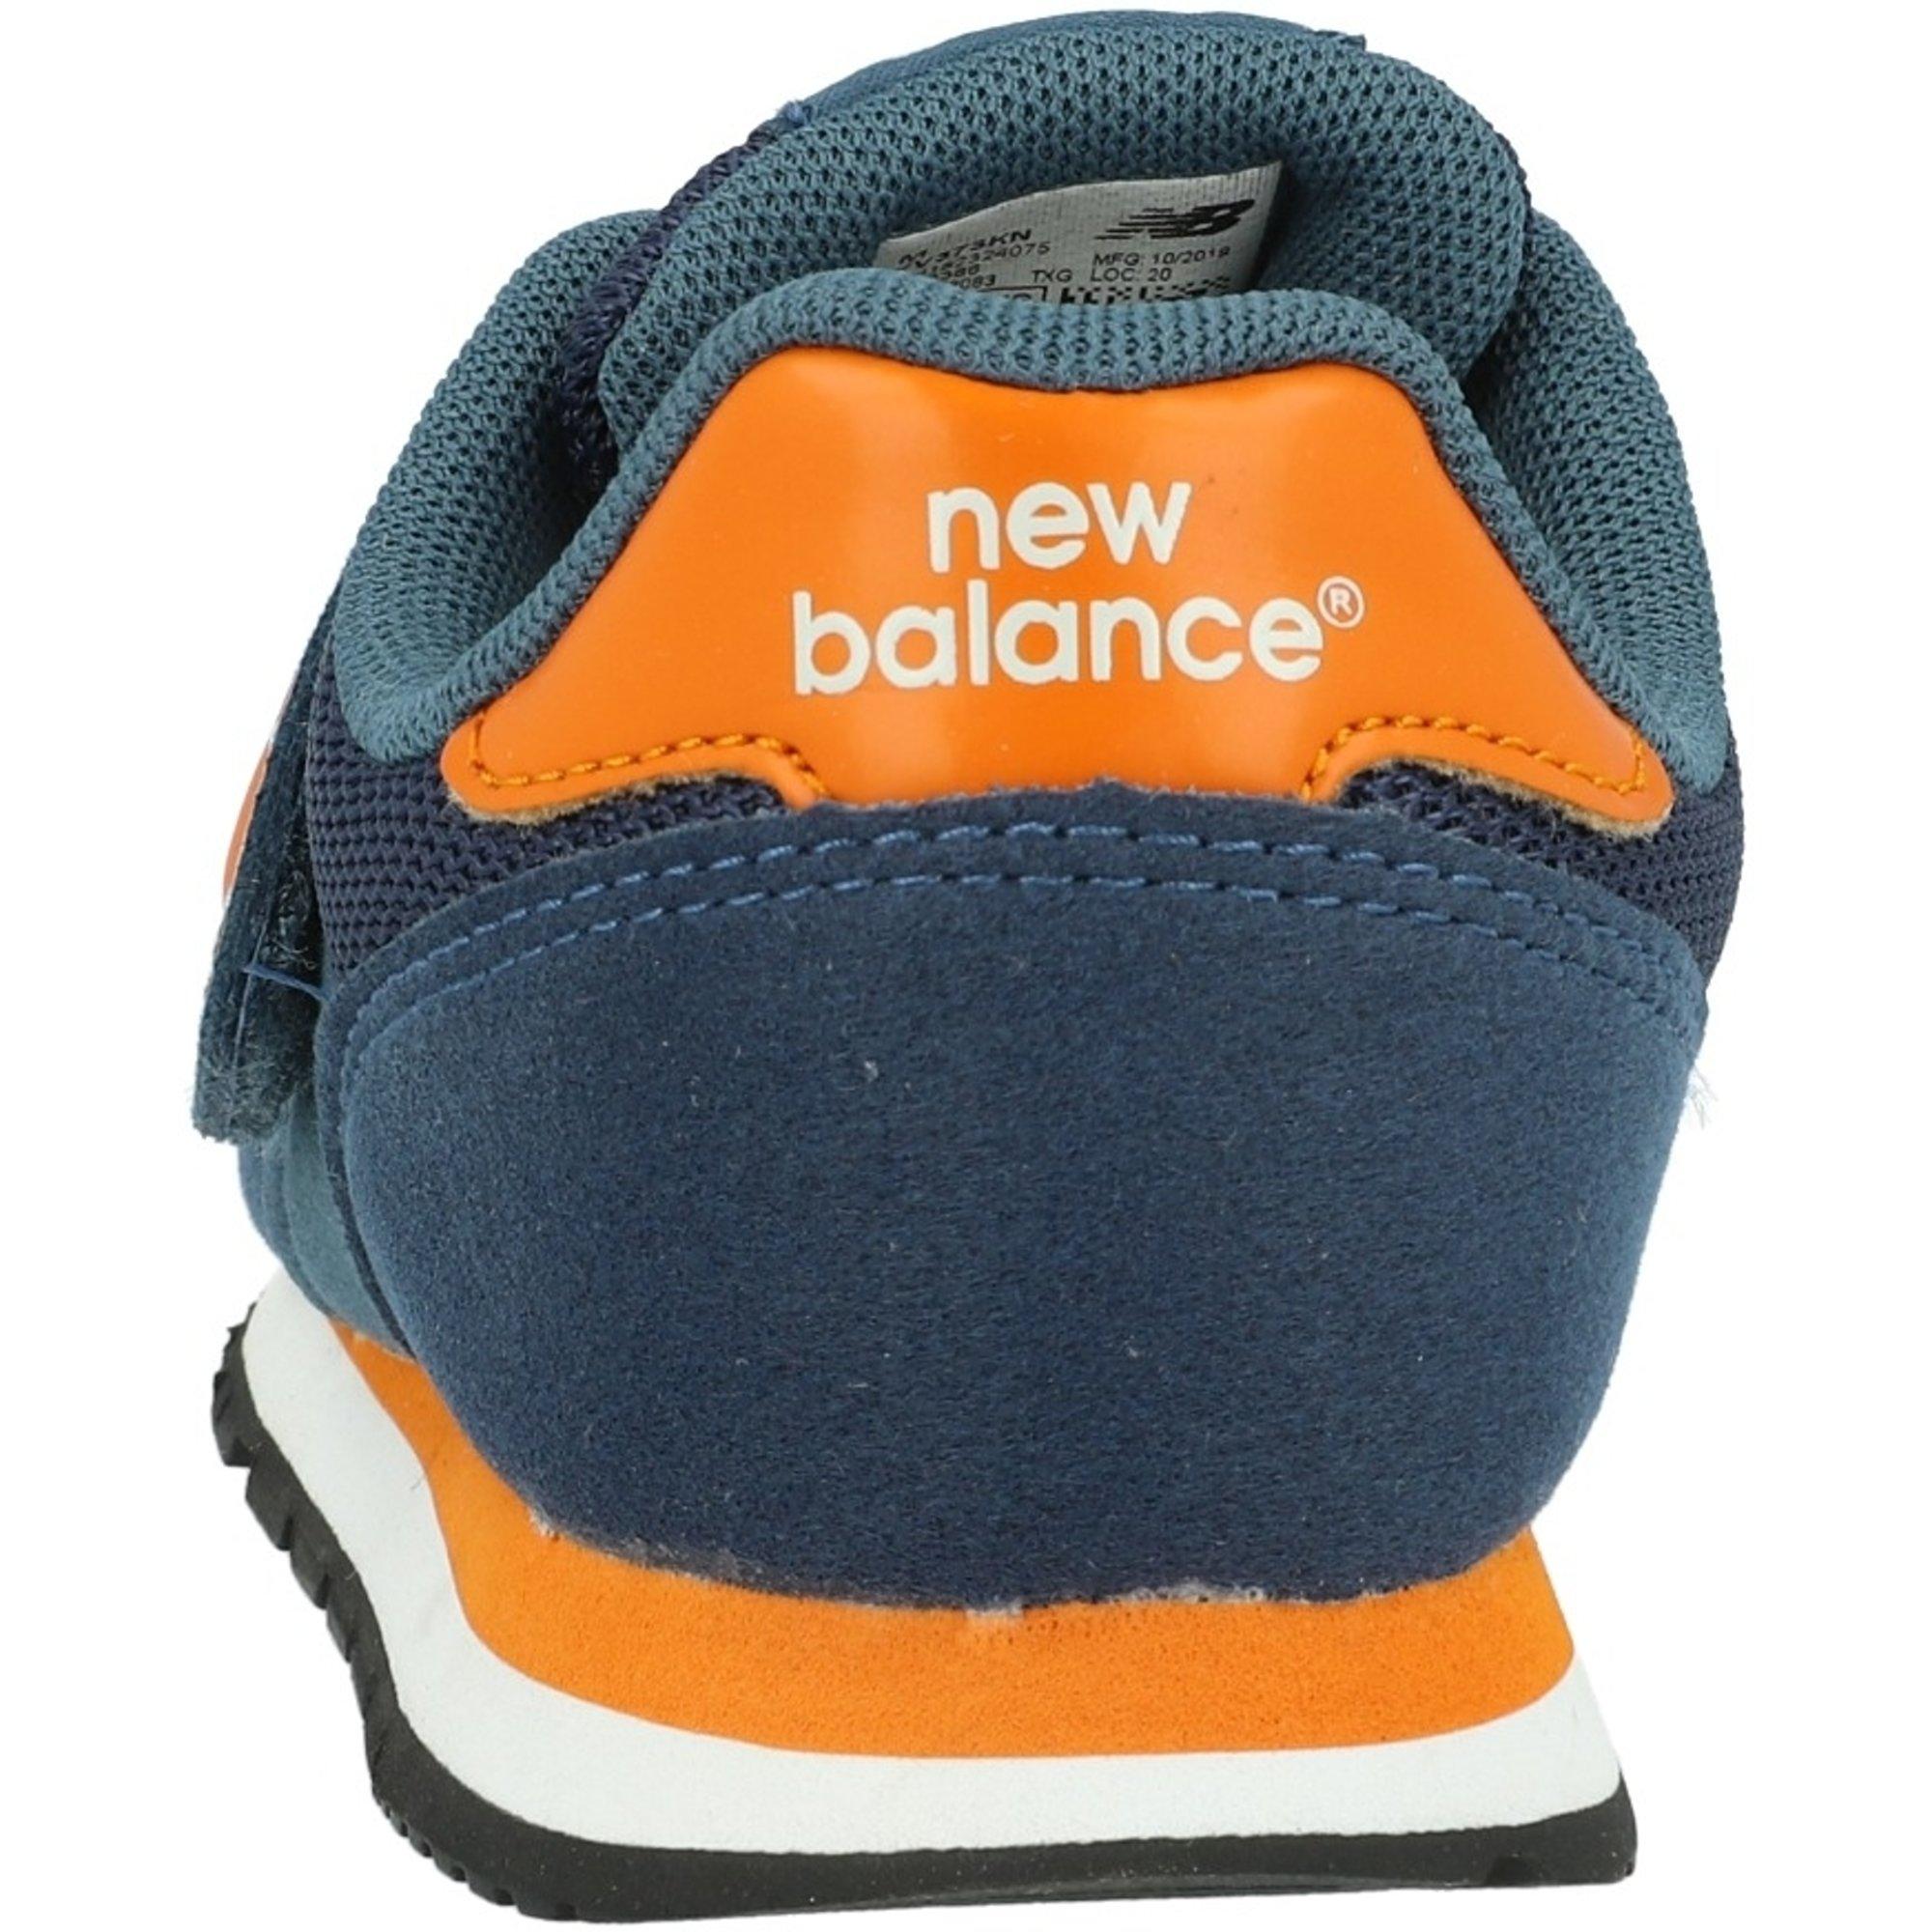 new balance 373 vintage